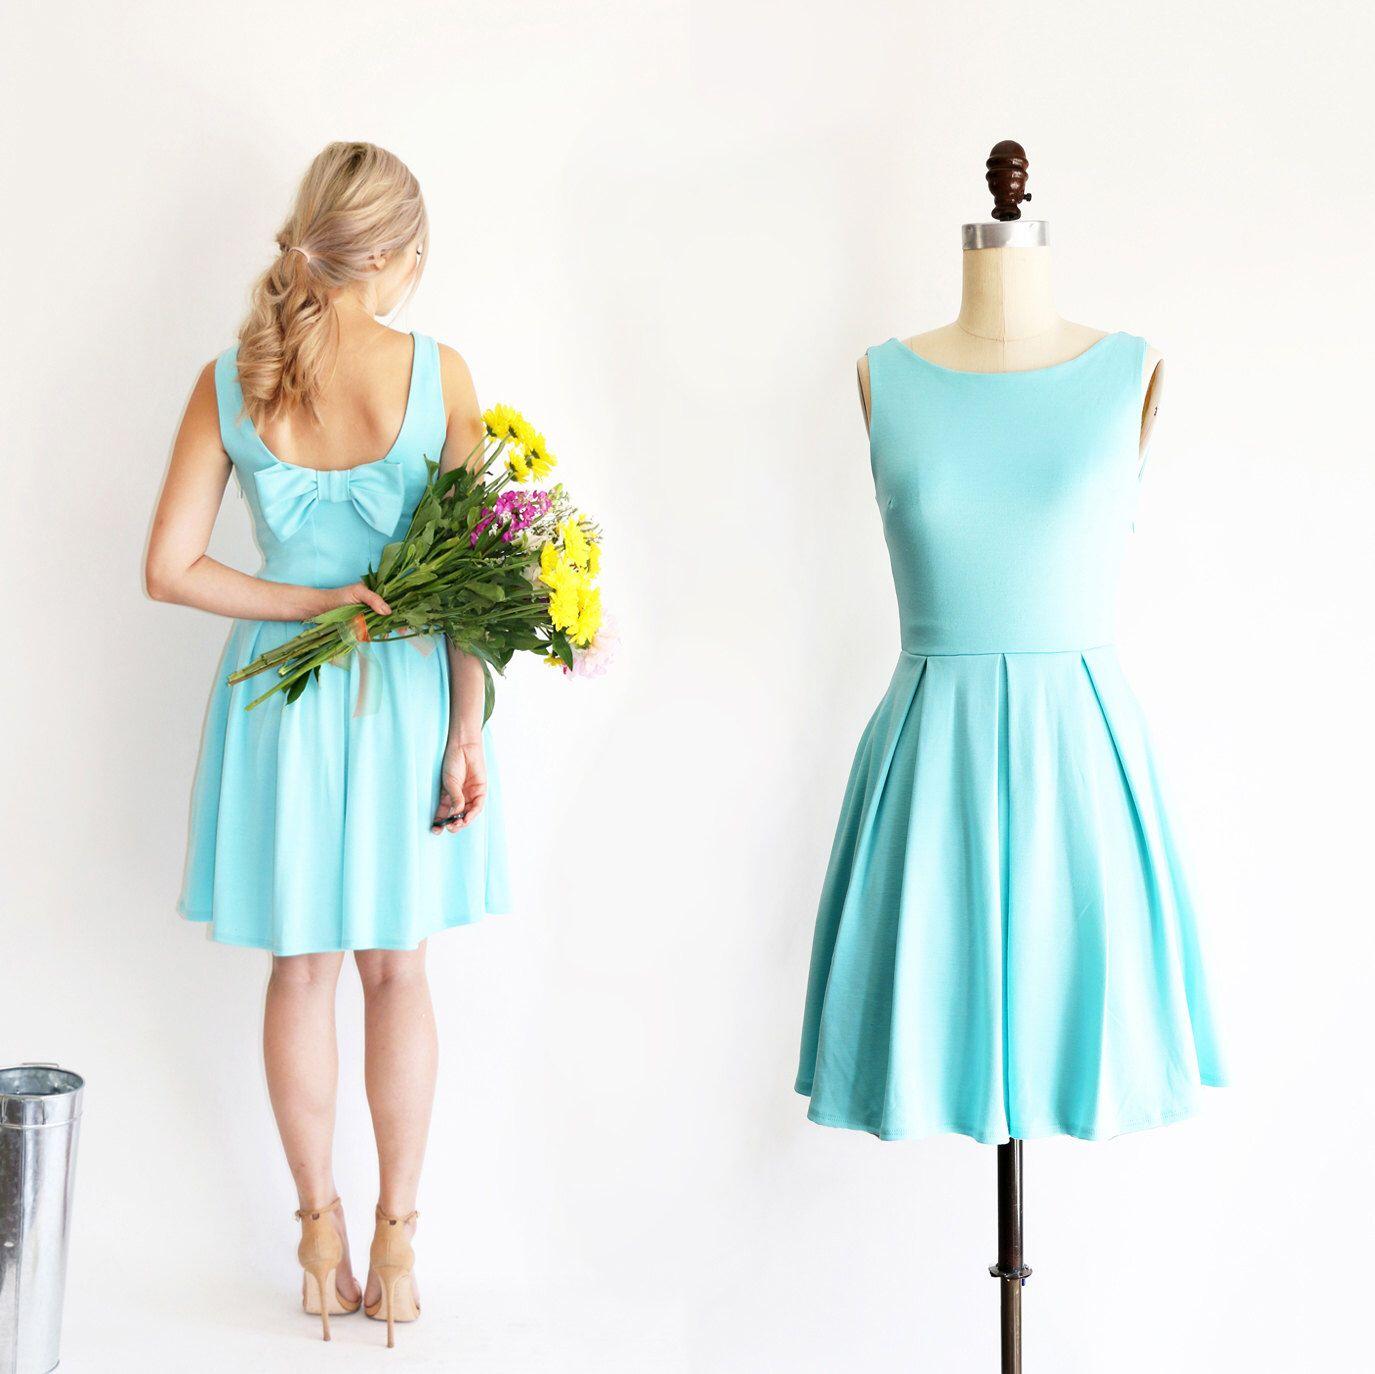 Pin by Sarah Akin on Wedding   Pinterest   Turquoise party, Wedding ...